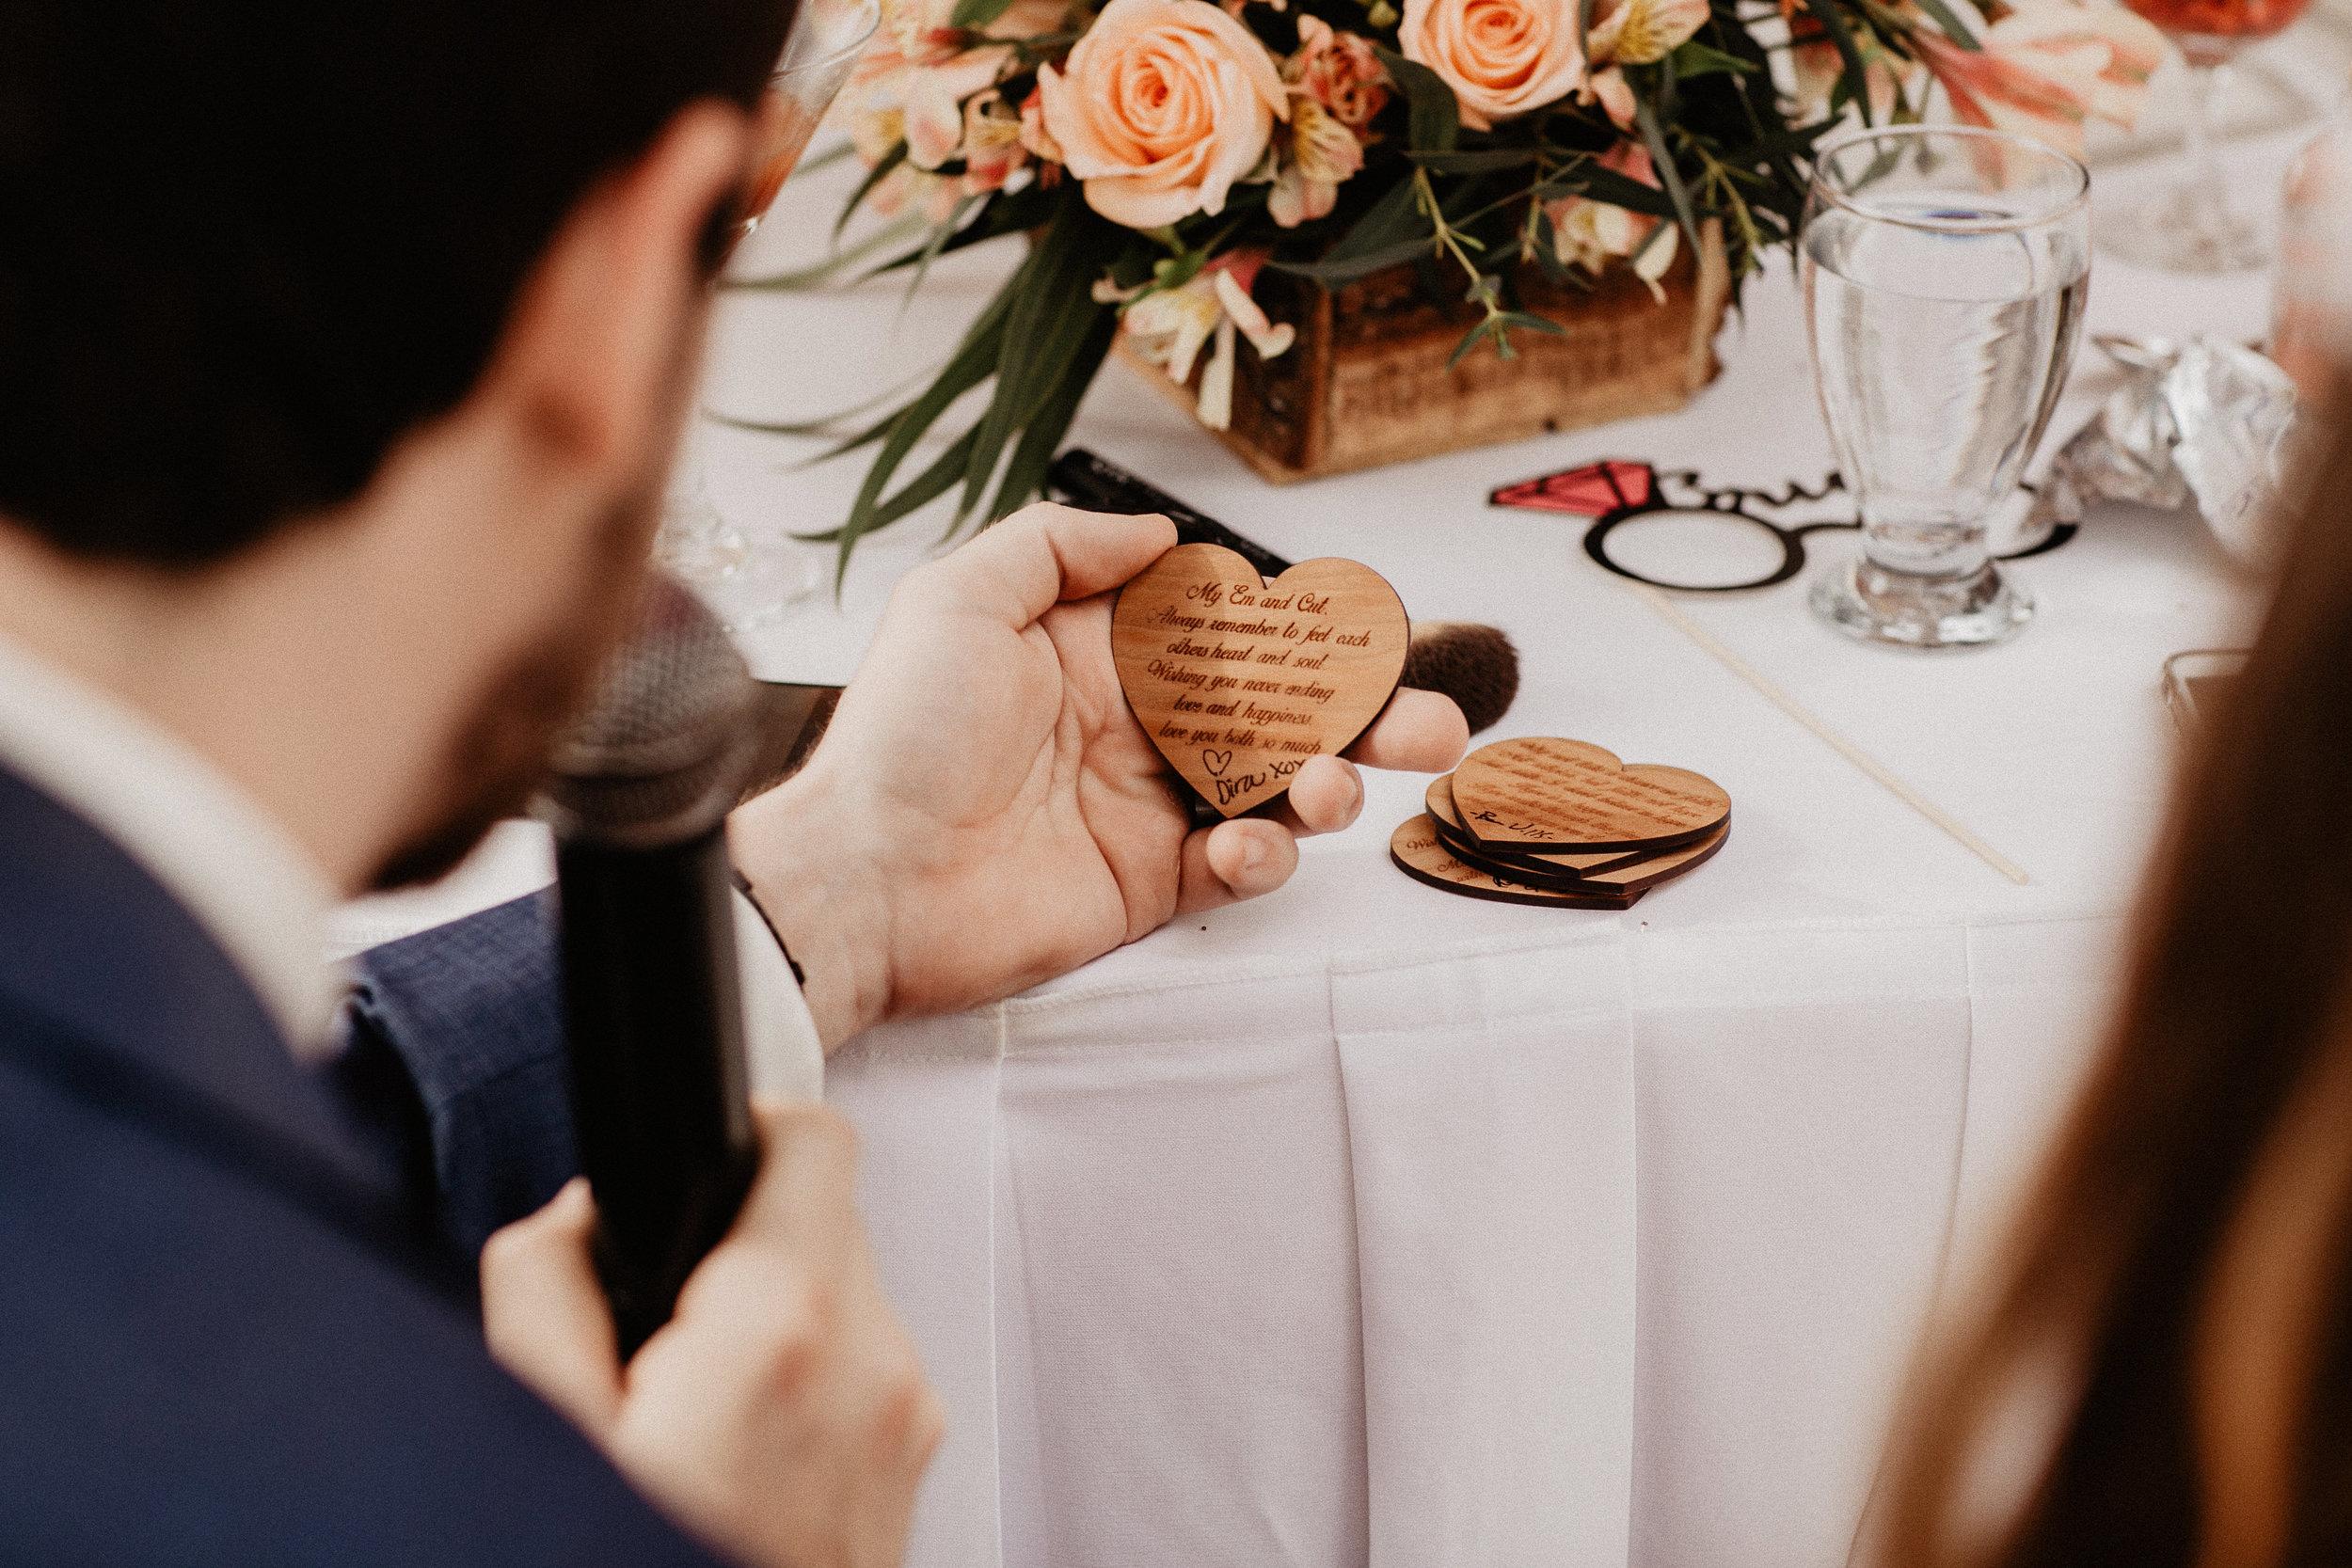 alfonso_flores_destination_wedding_photography_puerto_vallarta_hotel_barcelo_vallarta_cuttler_amela-573.JPG